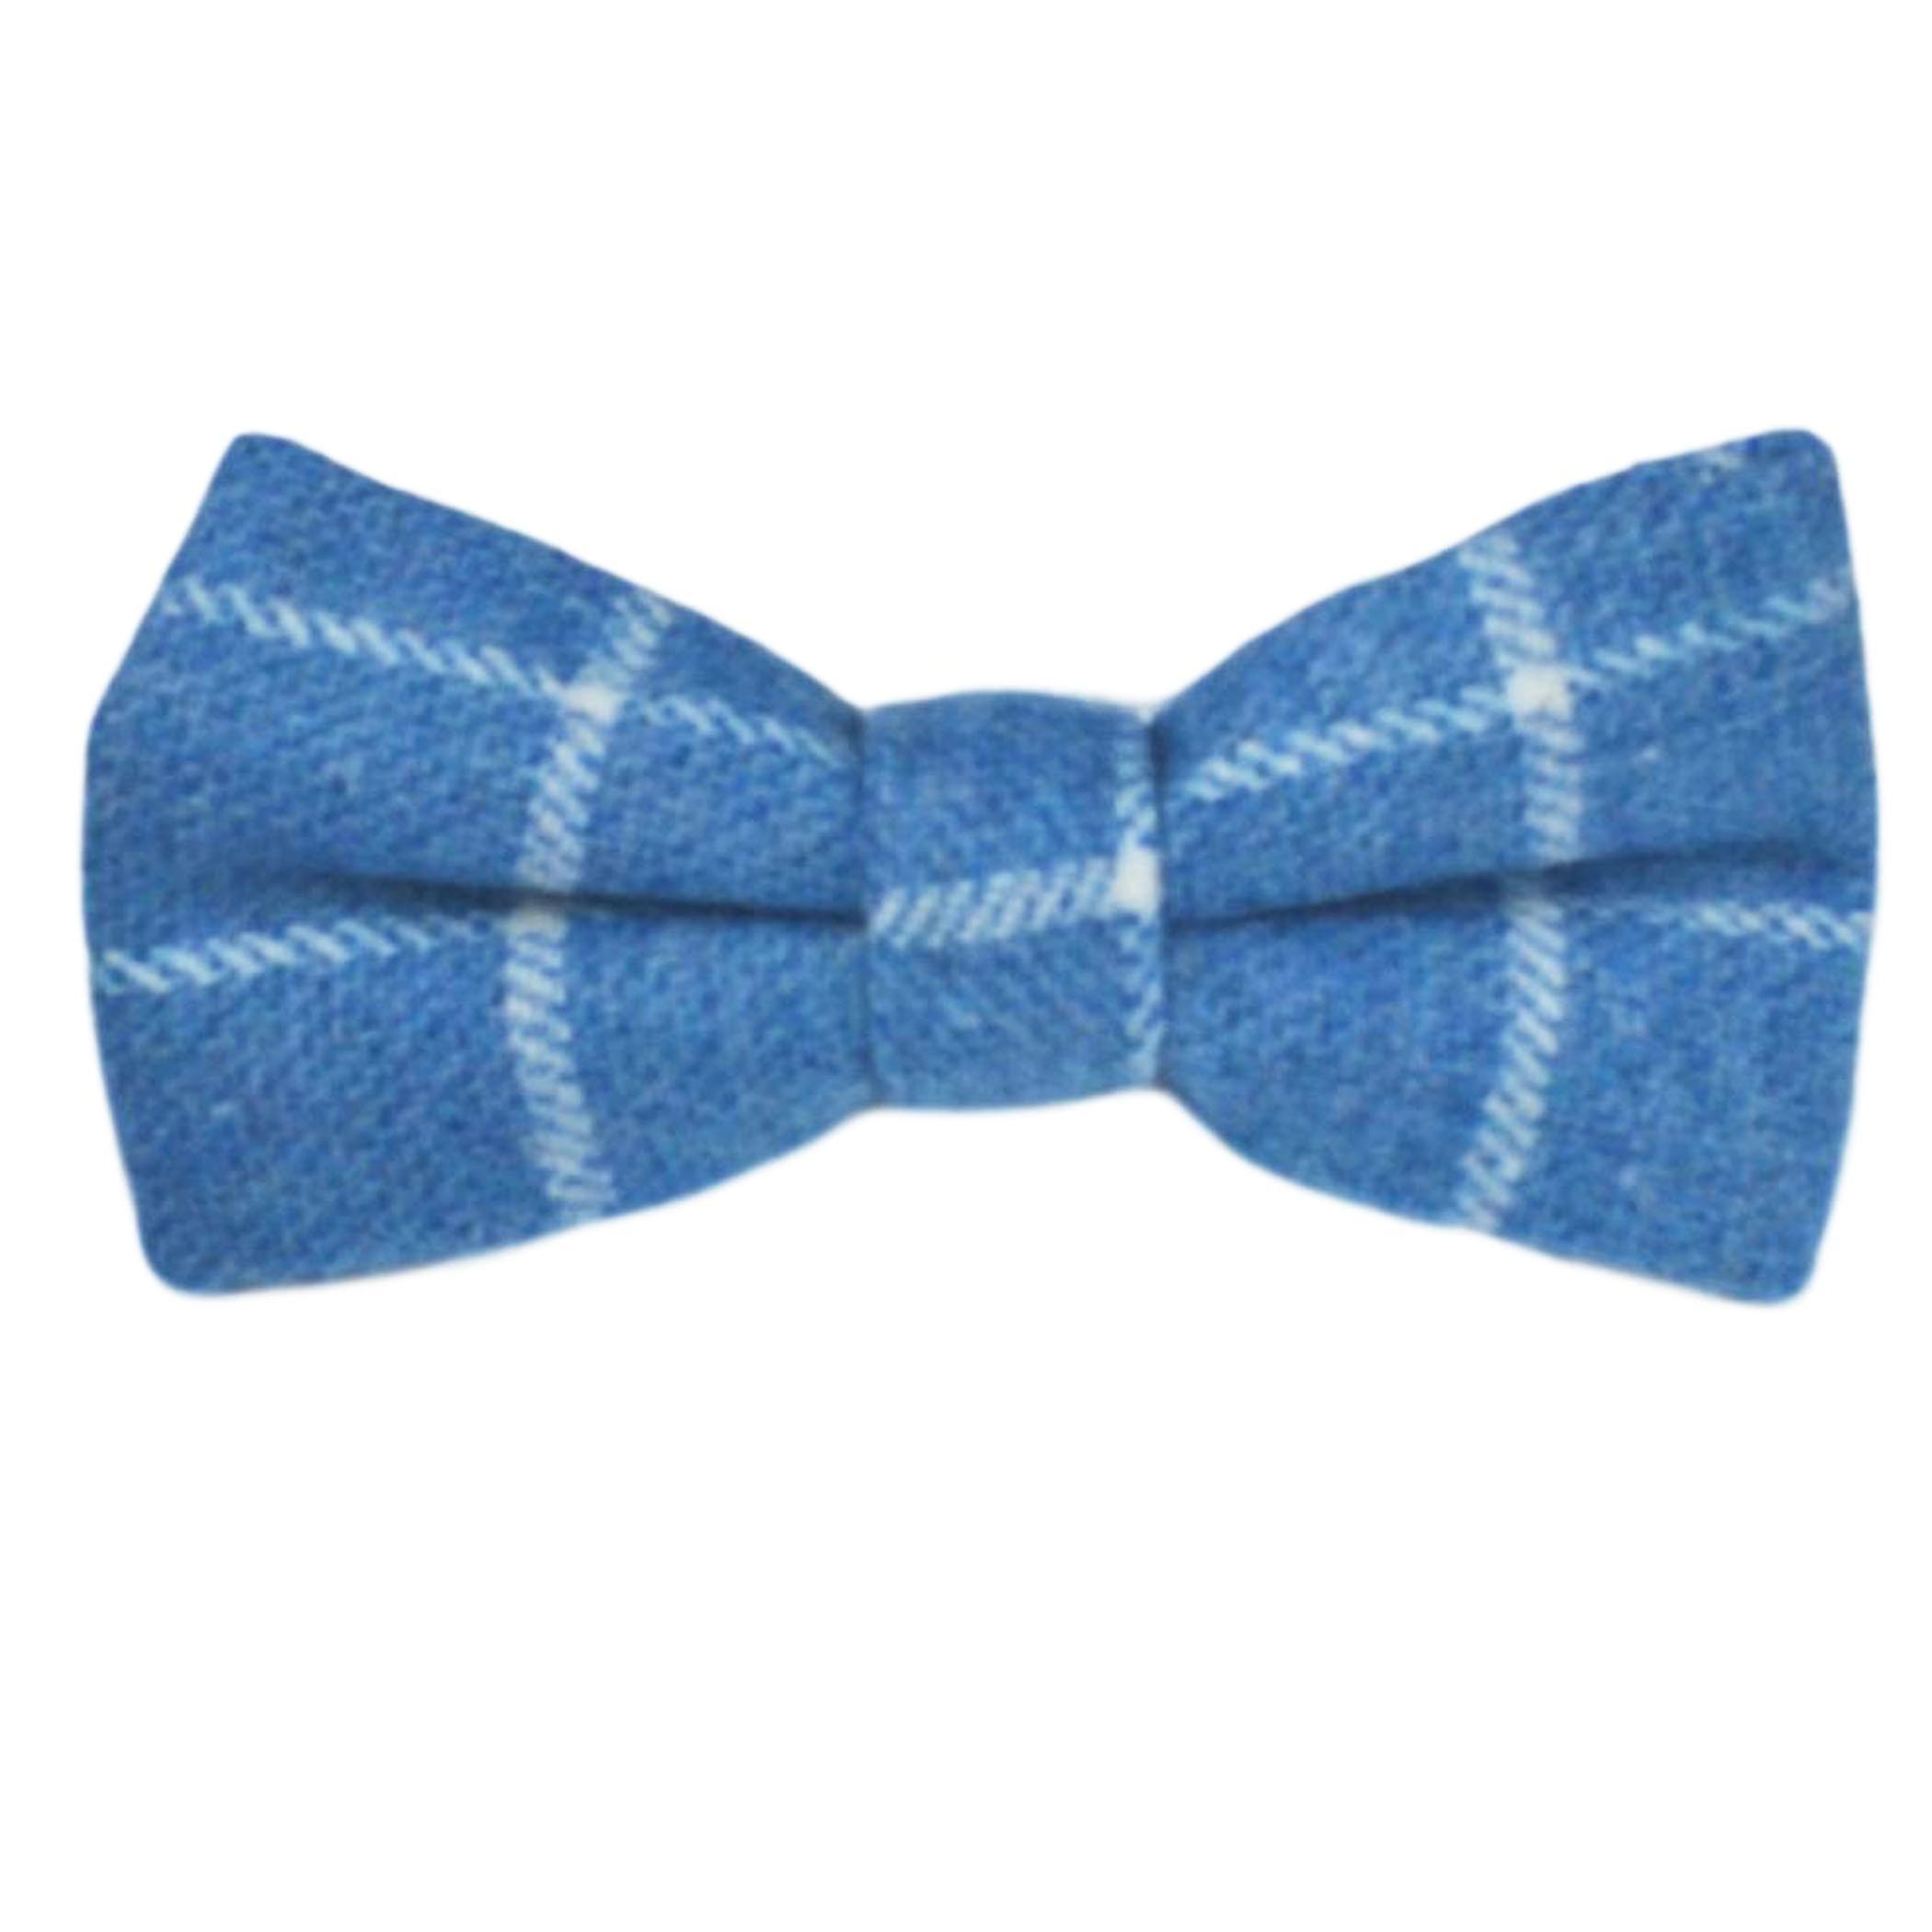 Azure Blue Birdseye Check Bow Tie